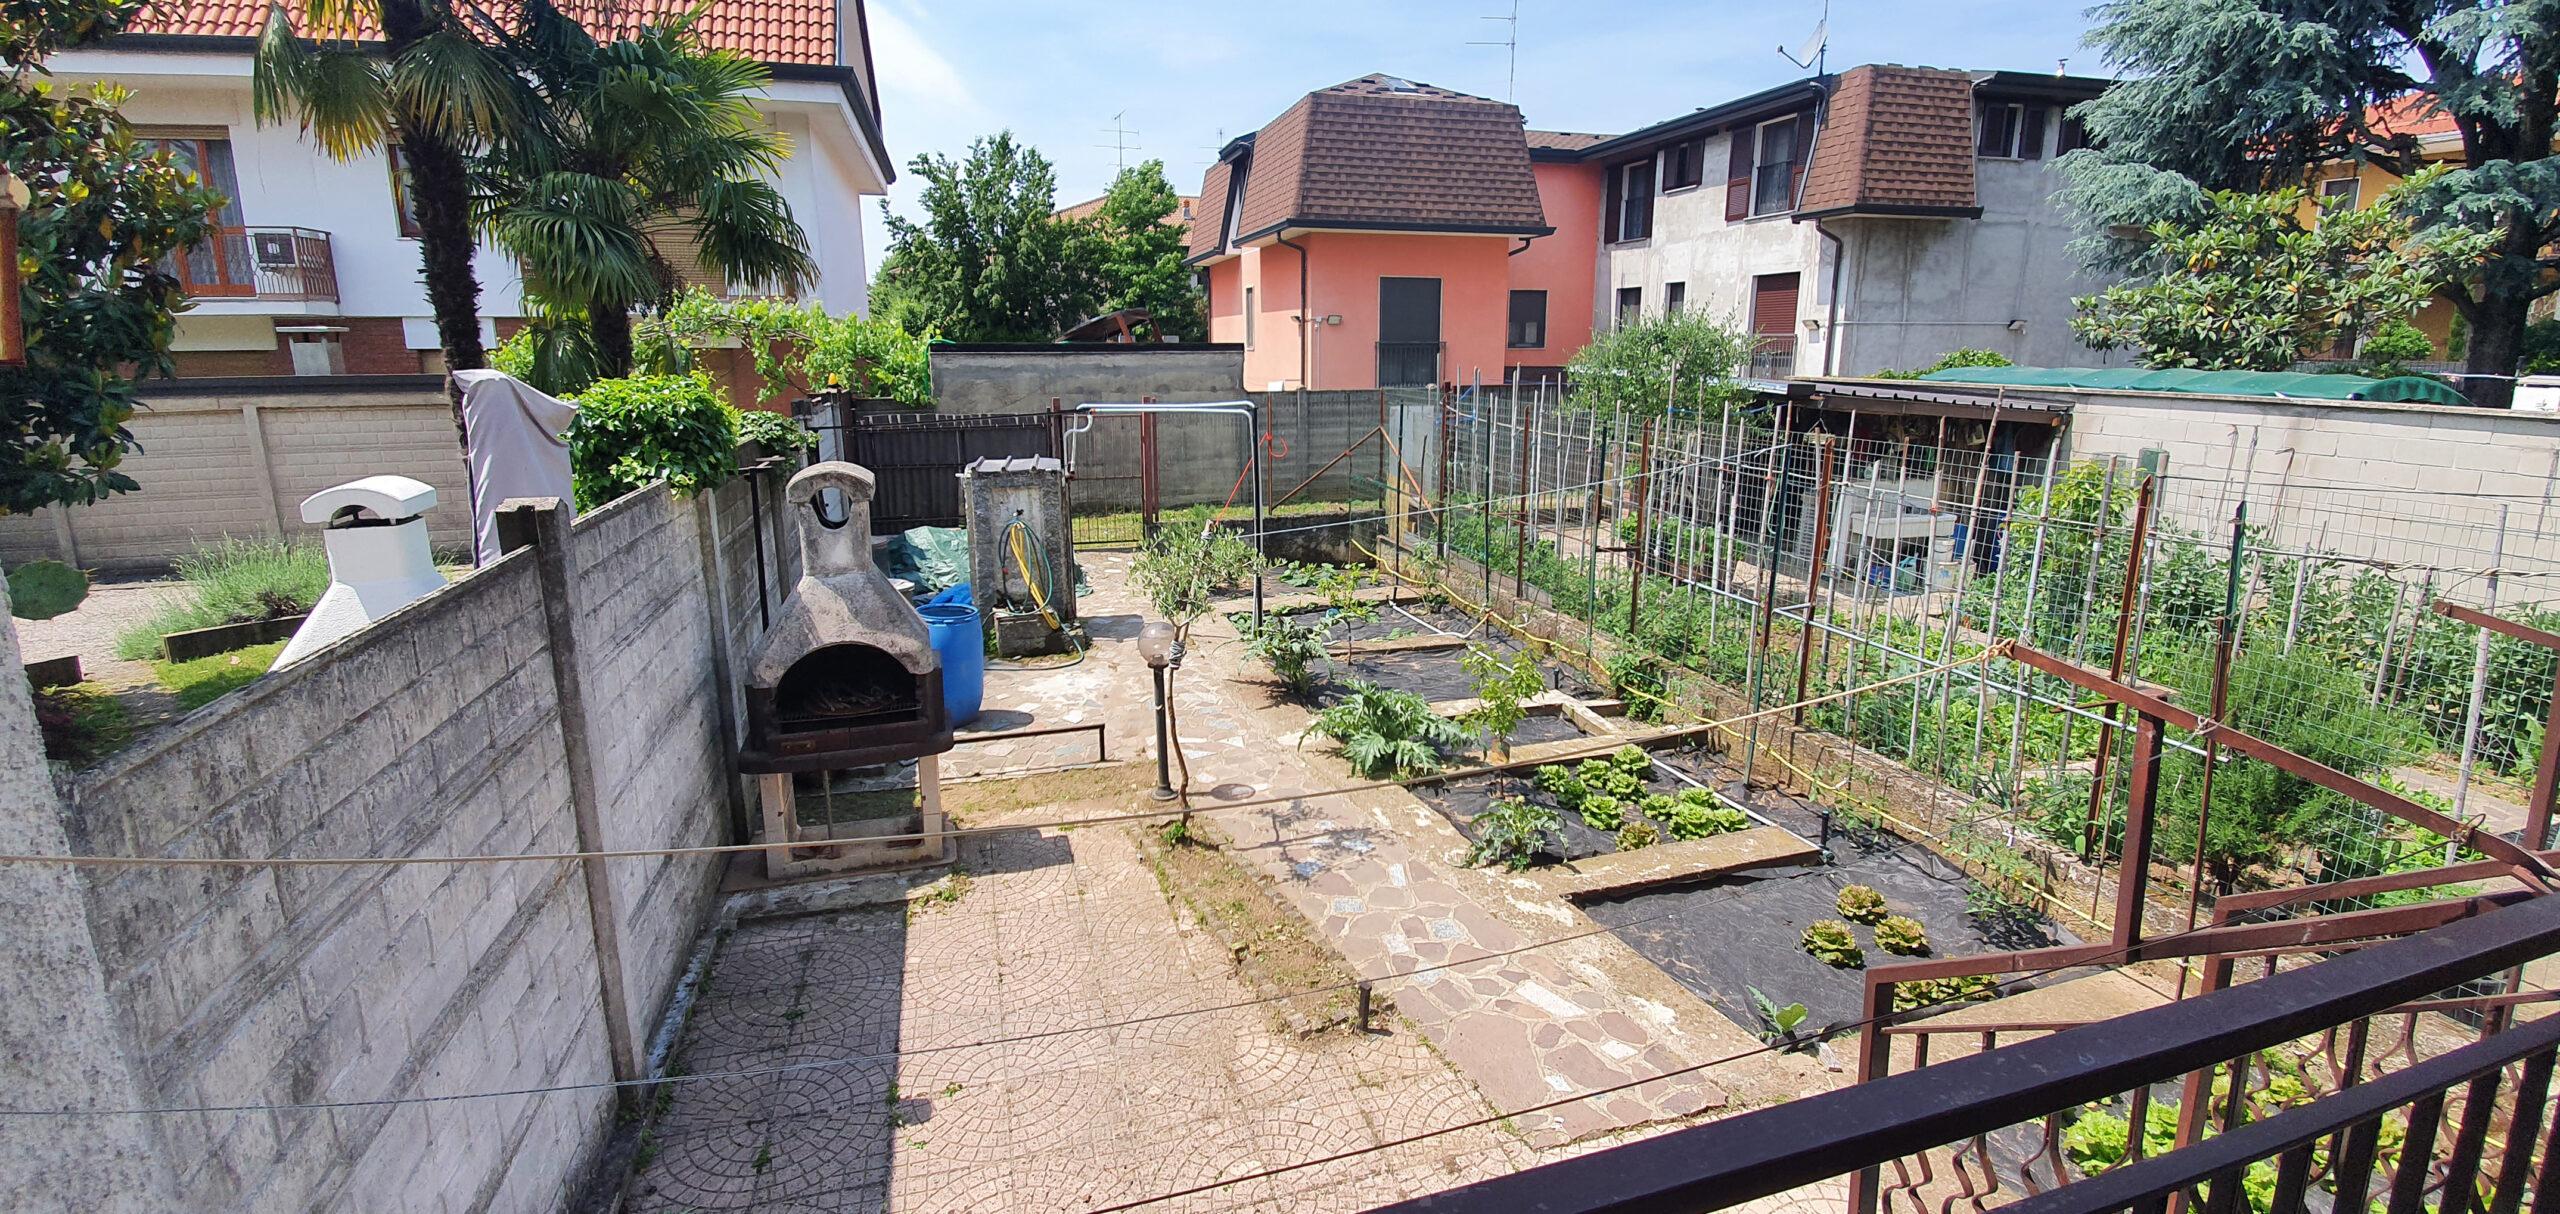 Villa a schiera con giardino in vendita a Dairago